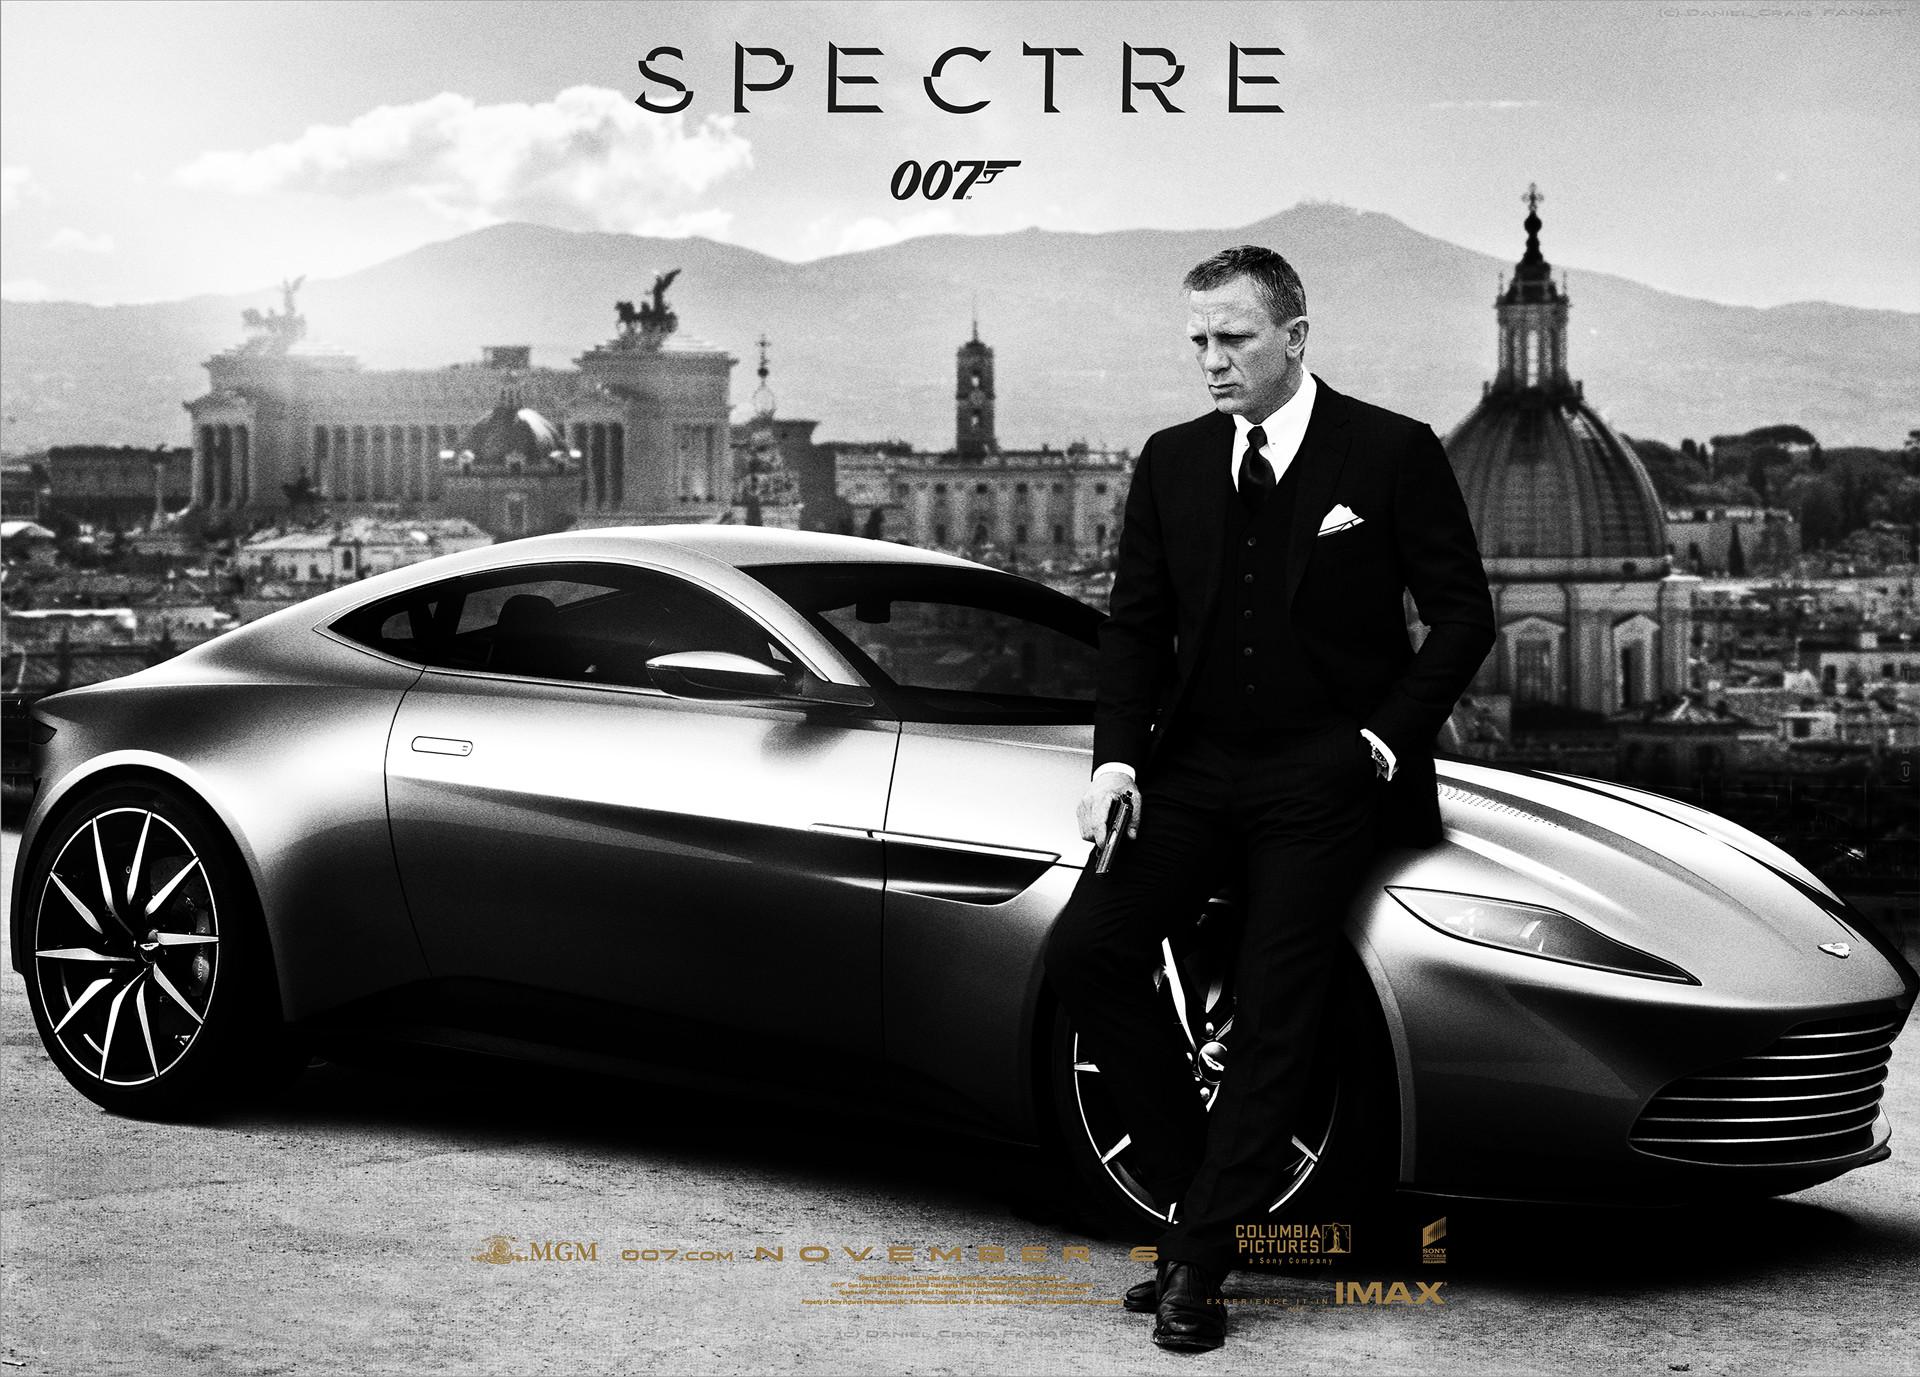 James Bond Movie Poster Wallpaper - WallpaperSafari